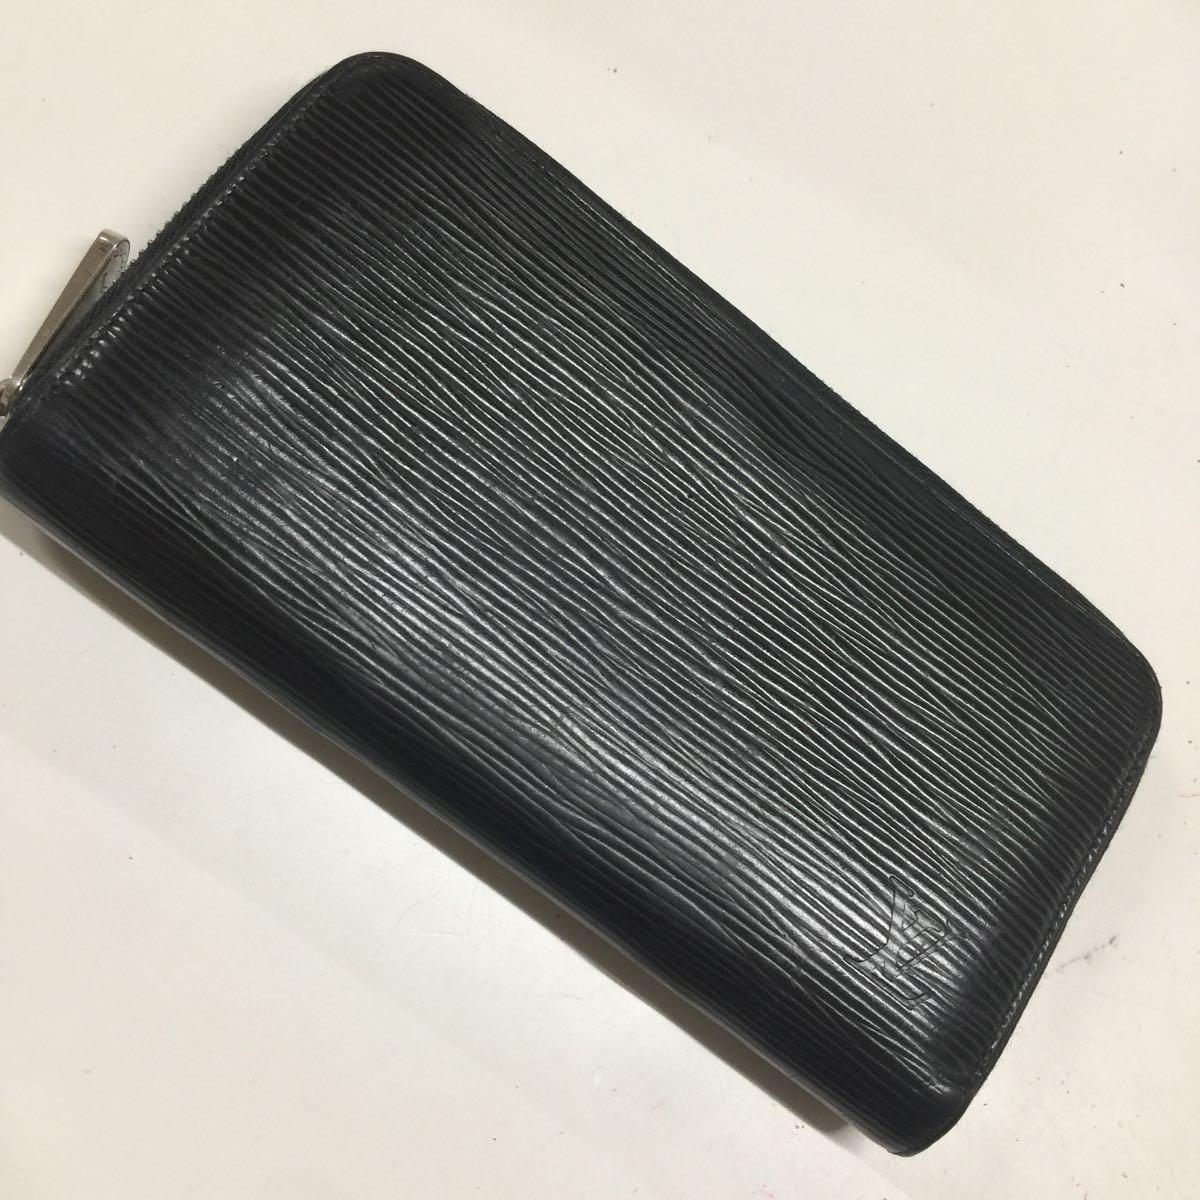 Louis Vuitton ルイヴィトン 長財布 エピ ブラック